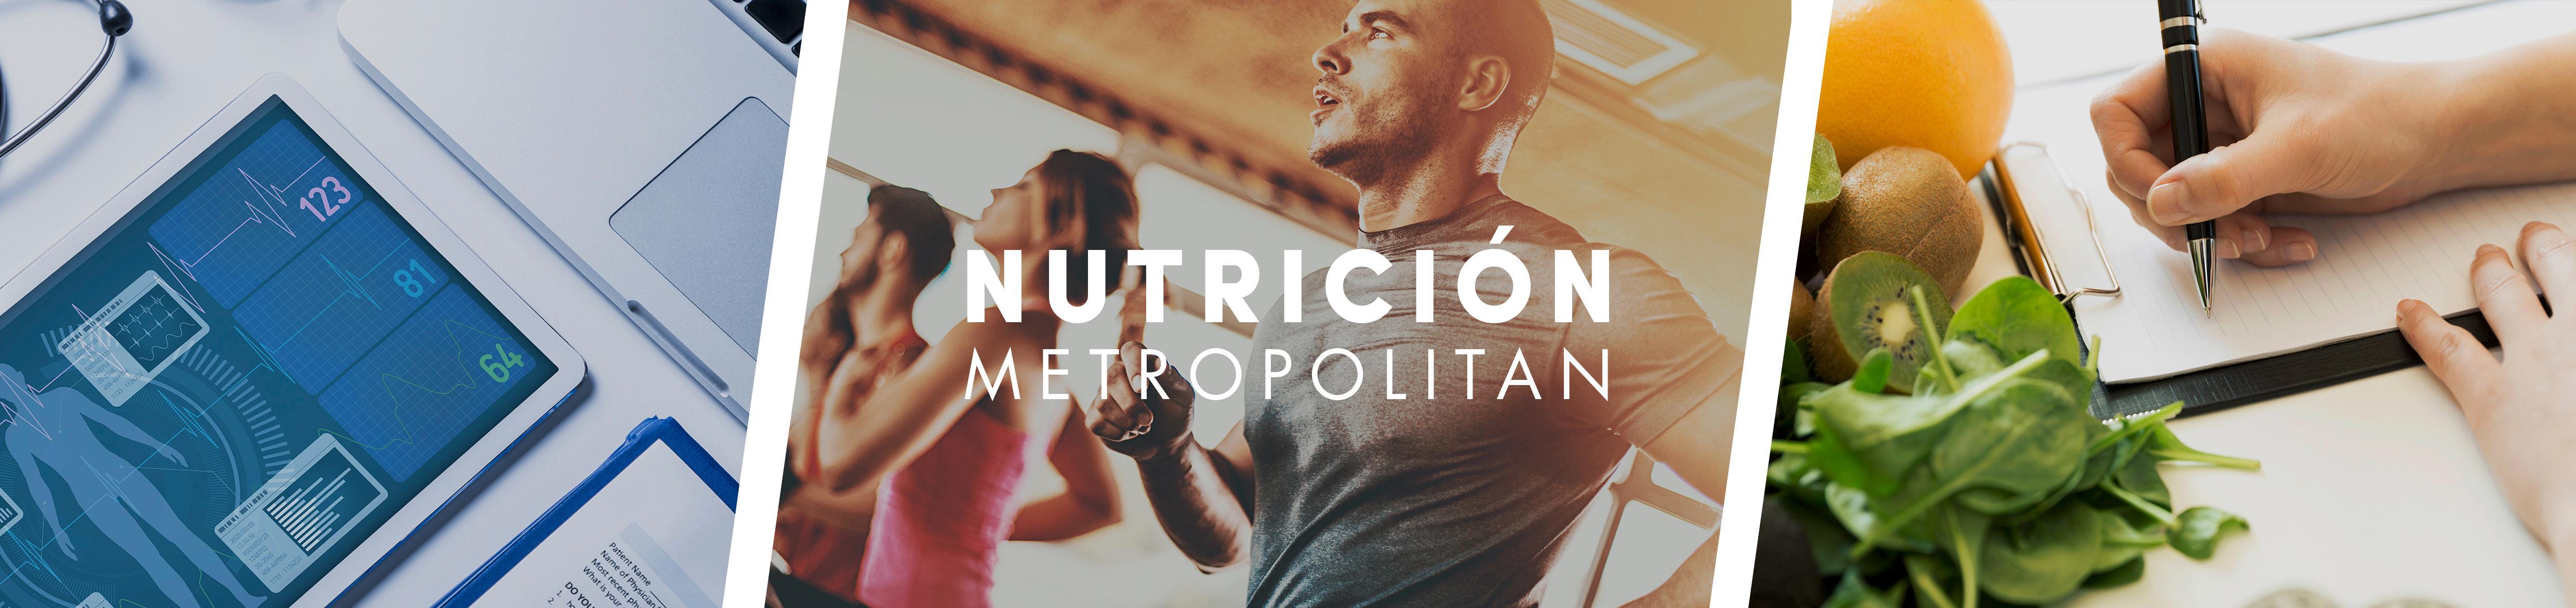 Nutrition service